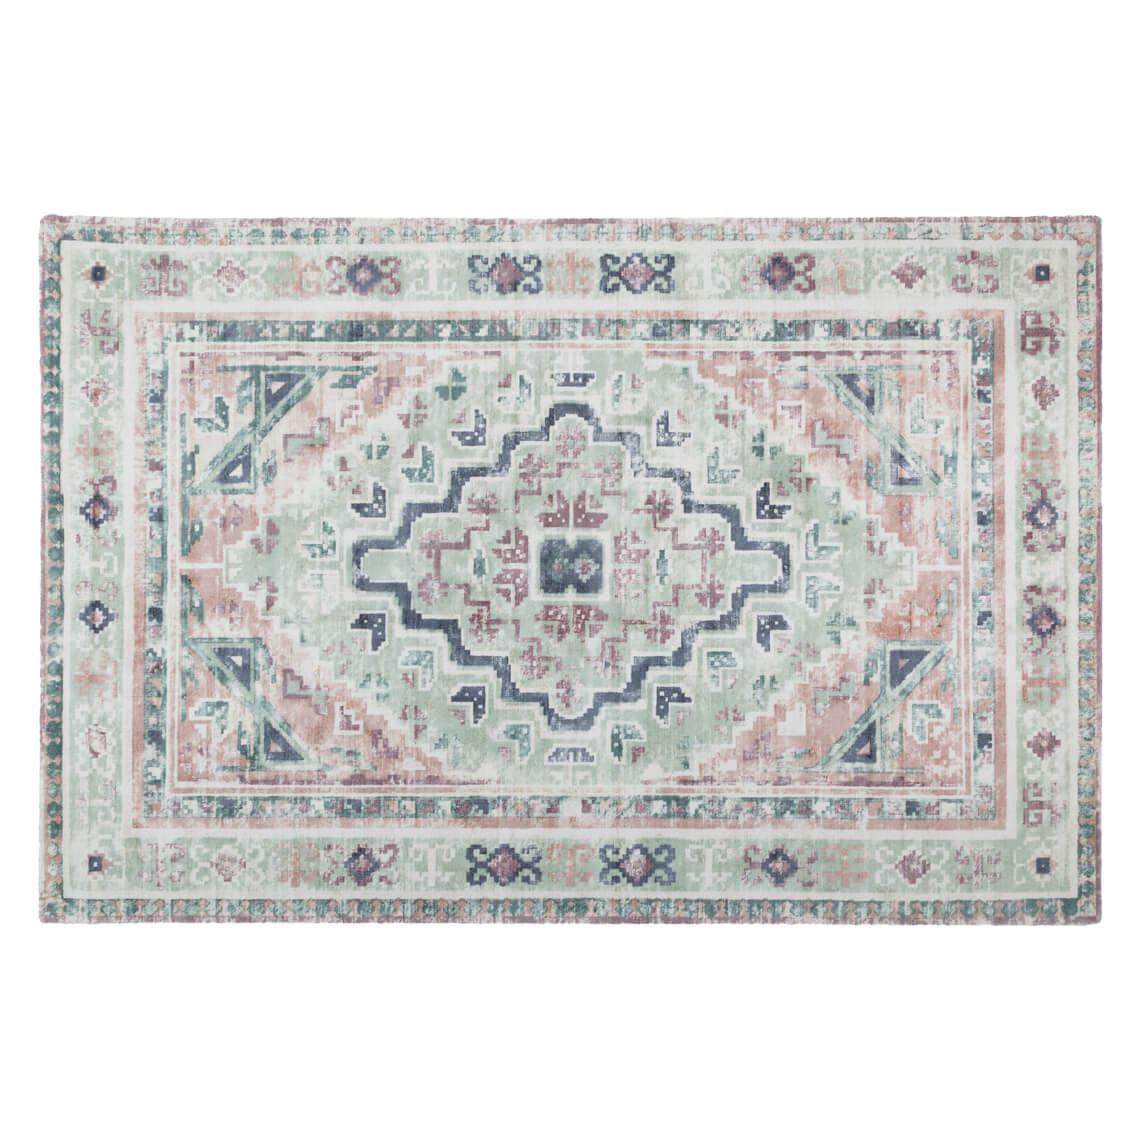 Jahaira Floor Rug Size W 200cm x D 300cm x H 1cm Freedom